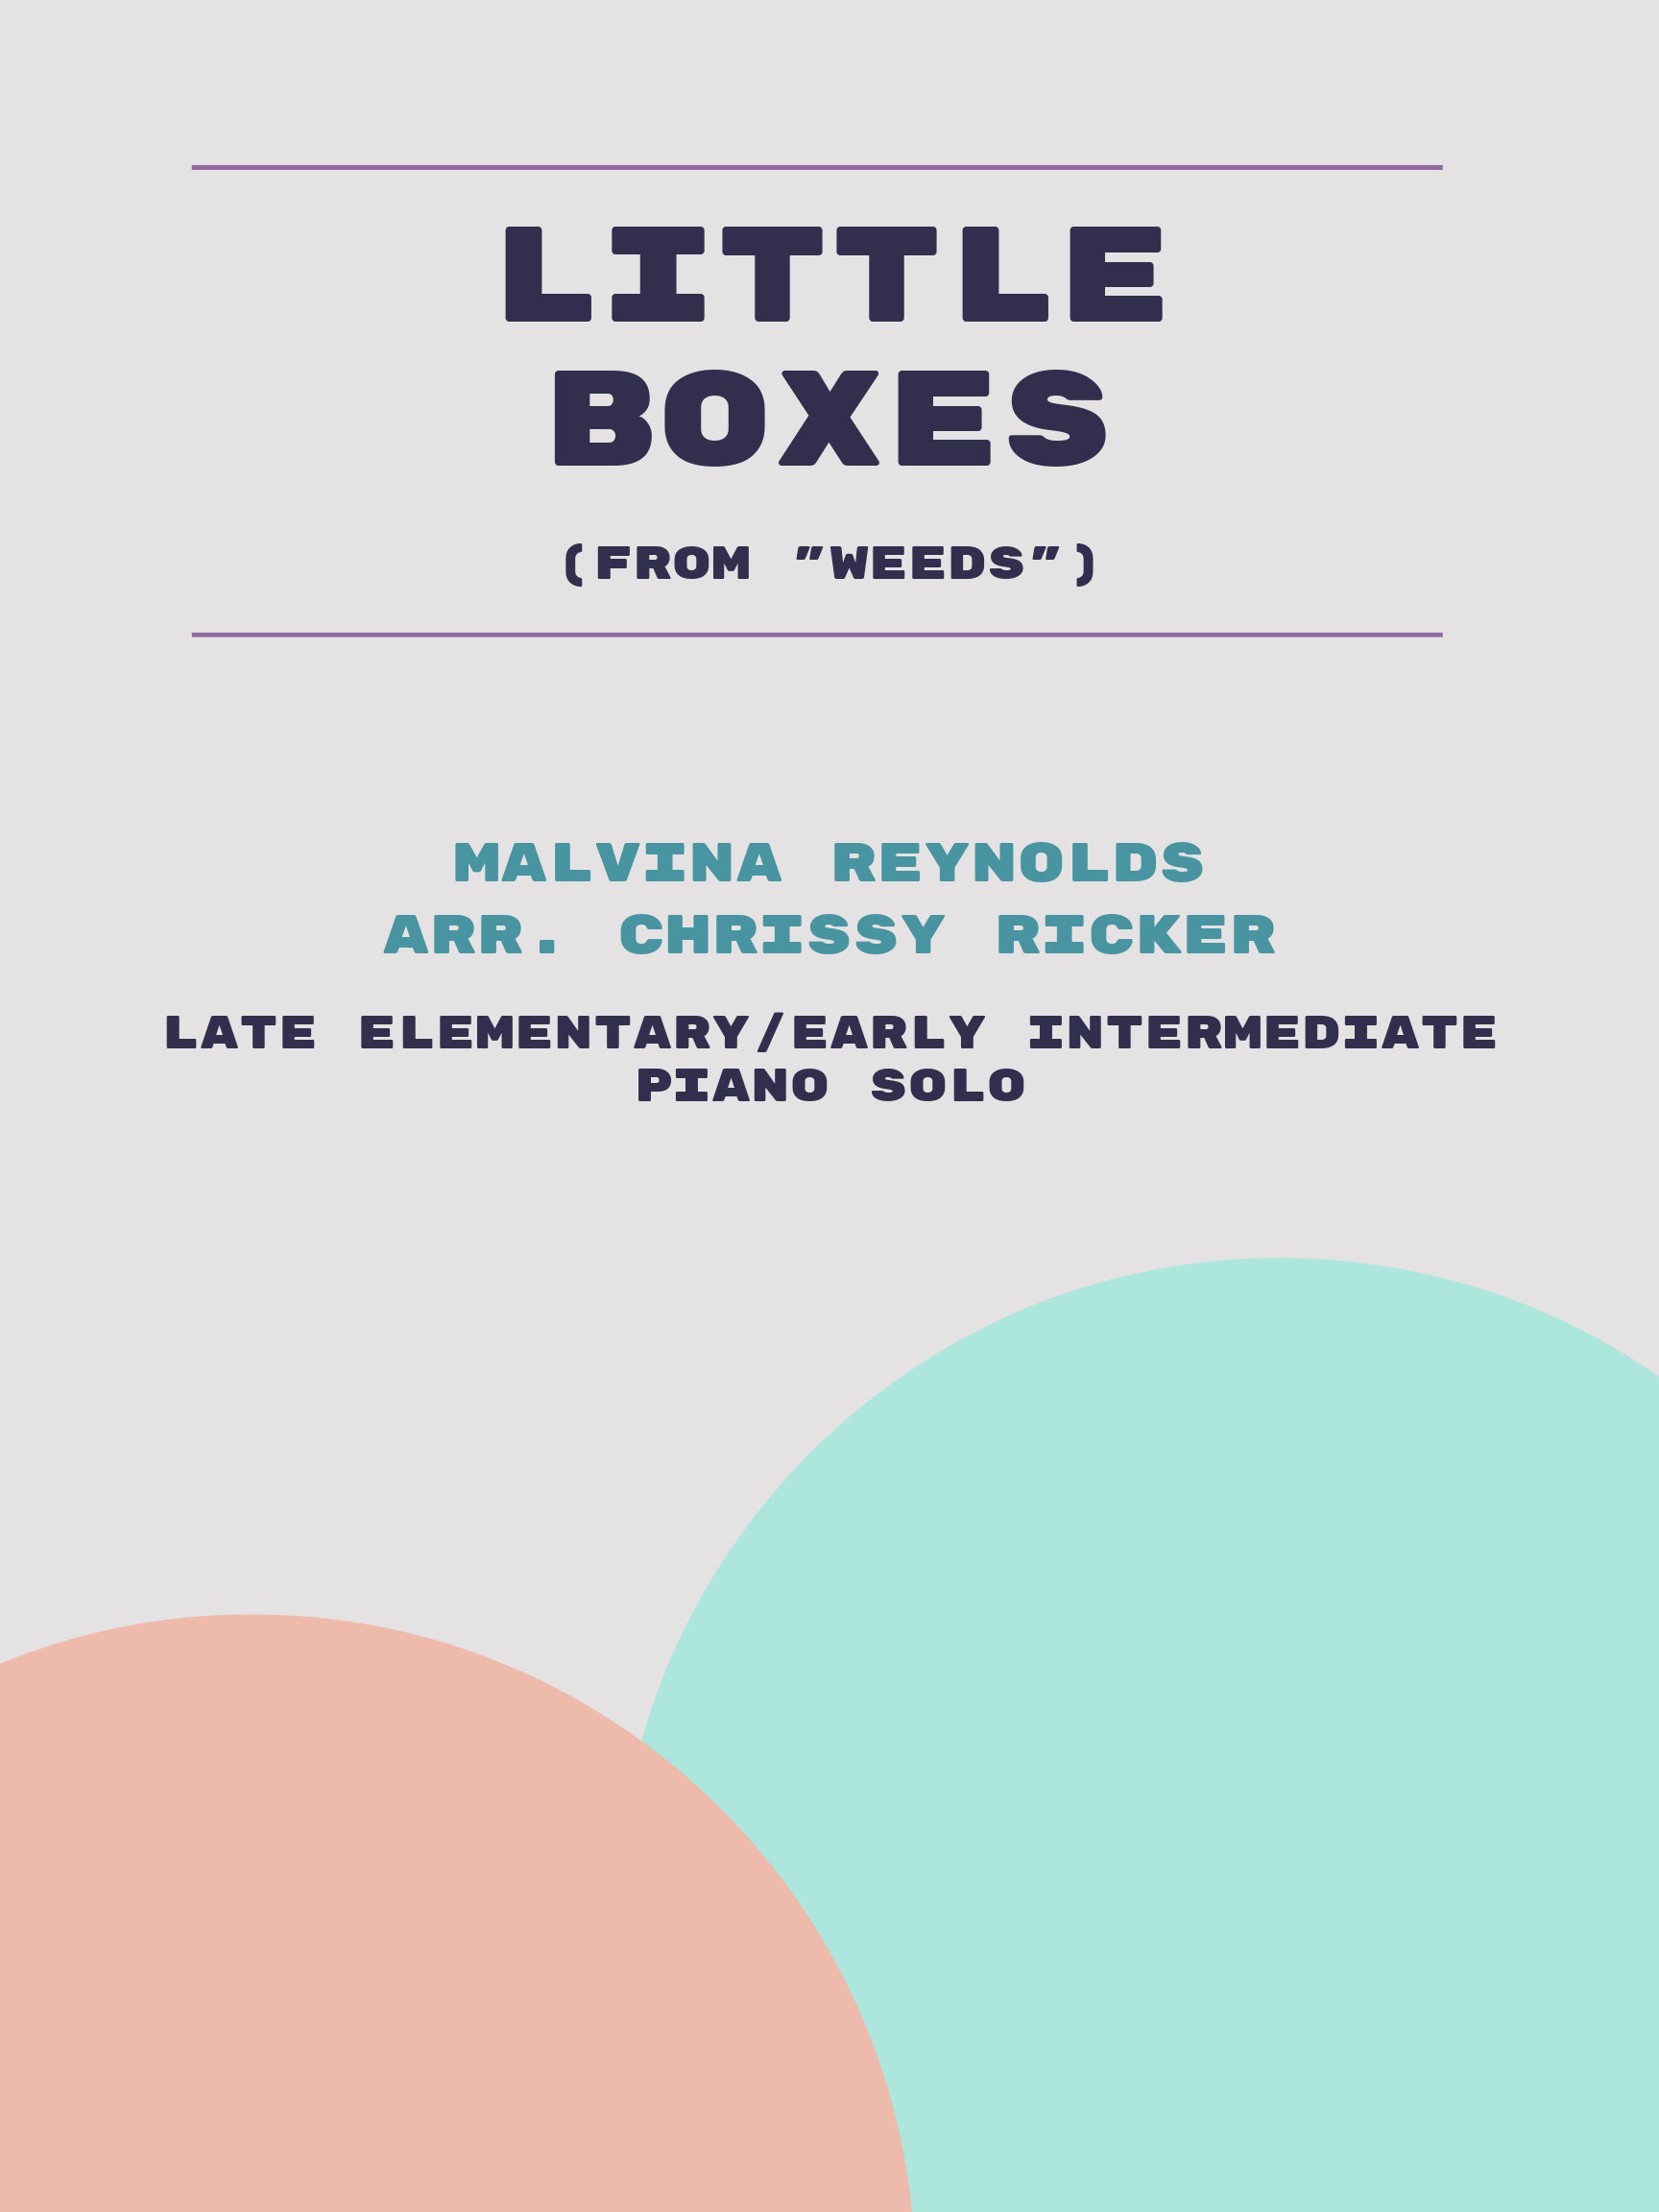 Little Boxes by Malvina Reynolds